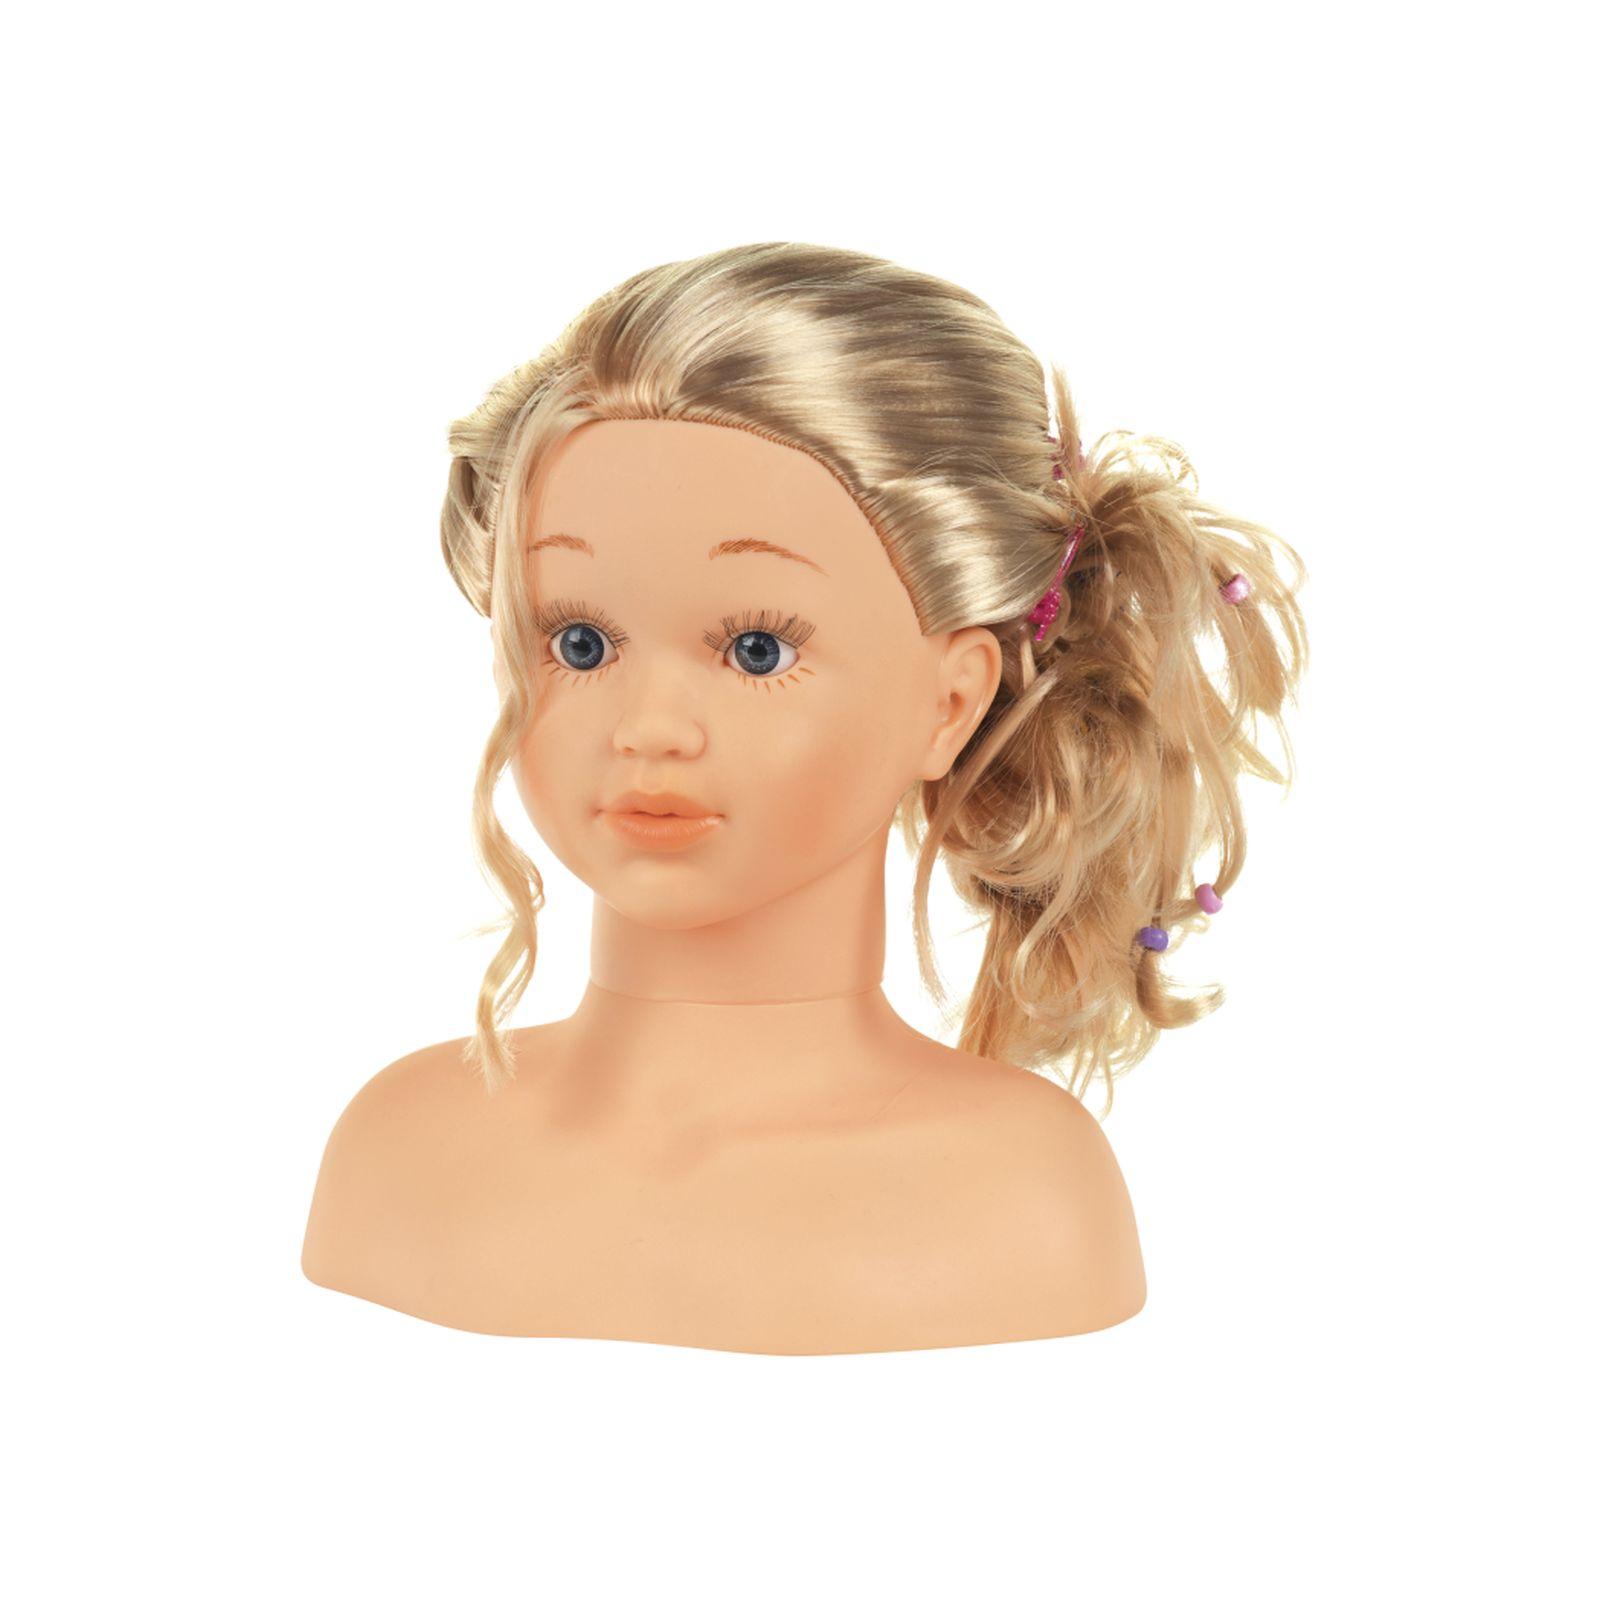 Princess milly - MISS FASHION